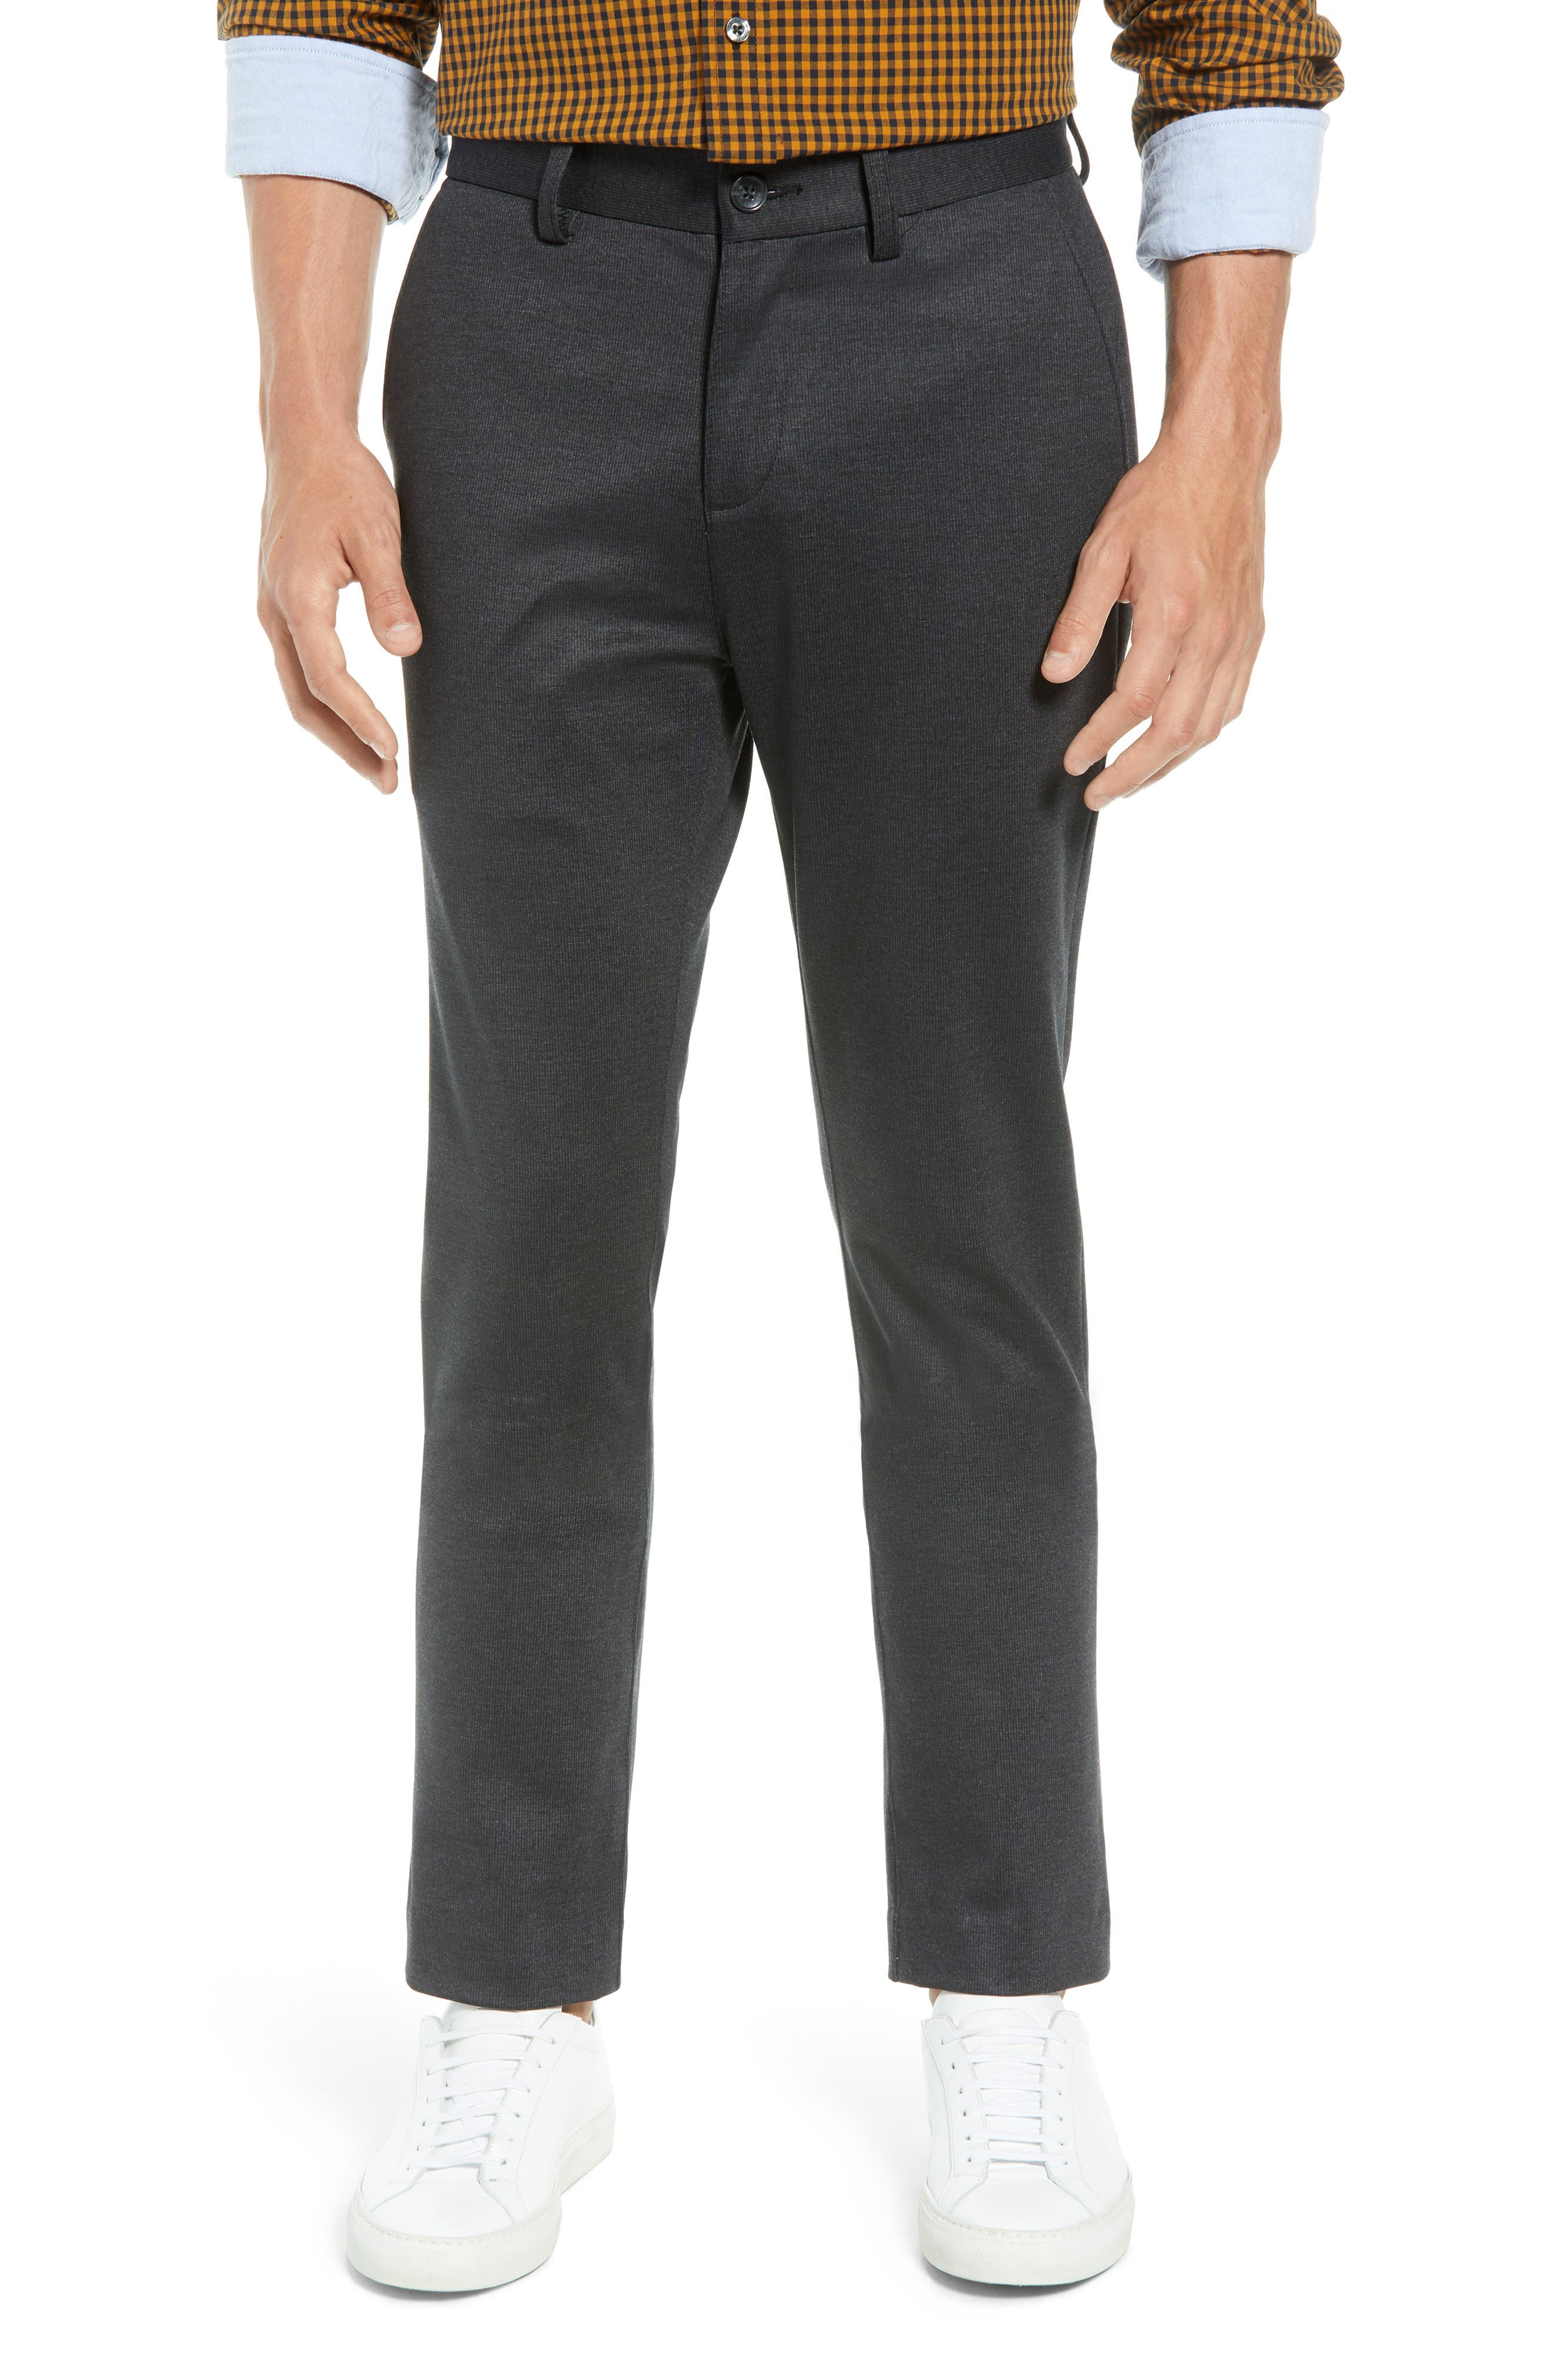 Slim Fit Ponte Knit Trousers,                             Main thumbnail 1, color,                             020